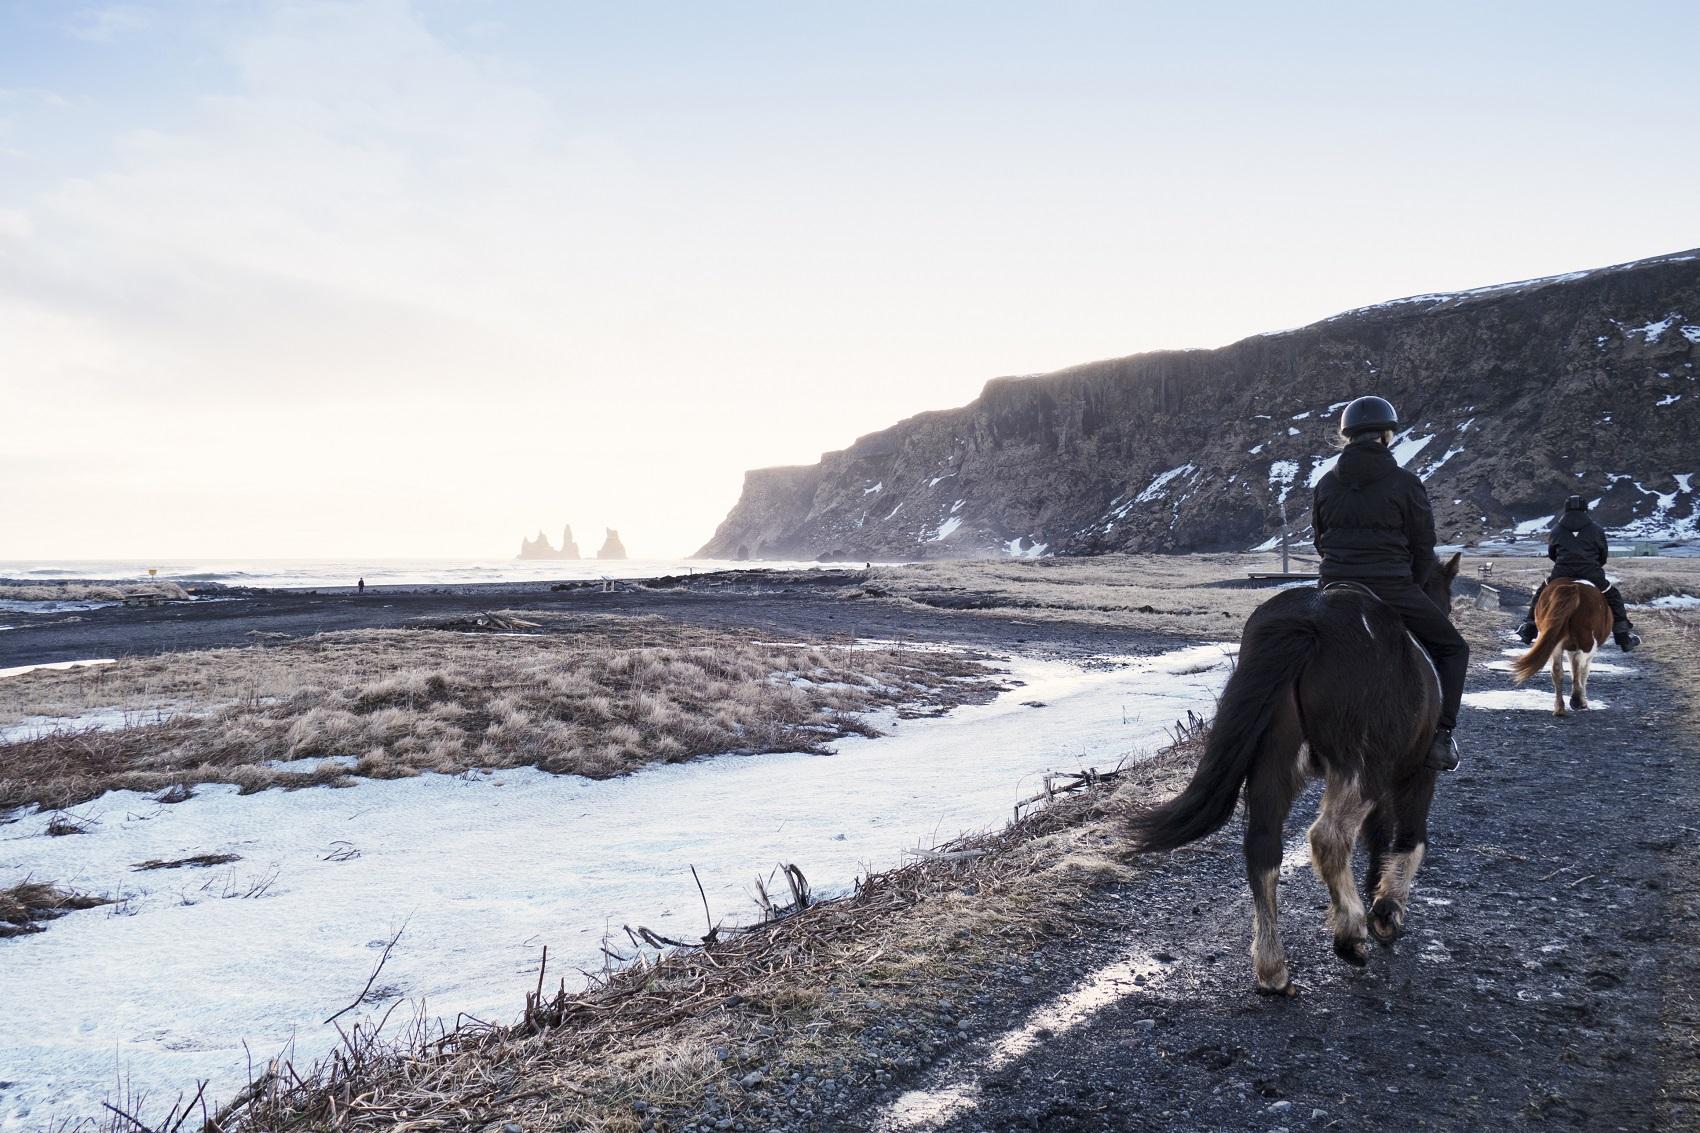 horse-riding-iceland-travel-goals